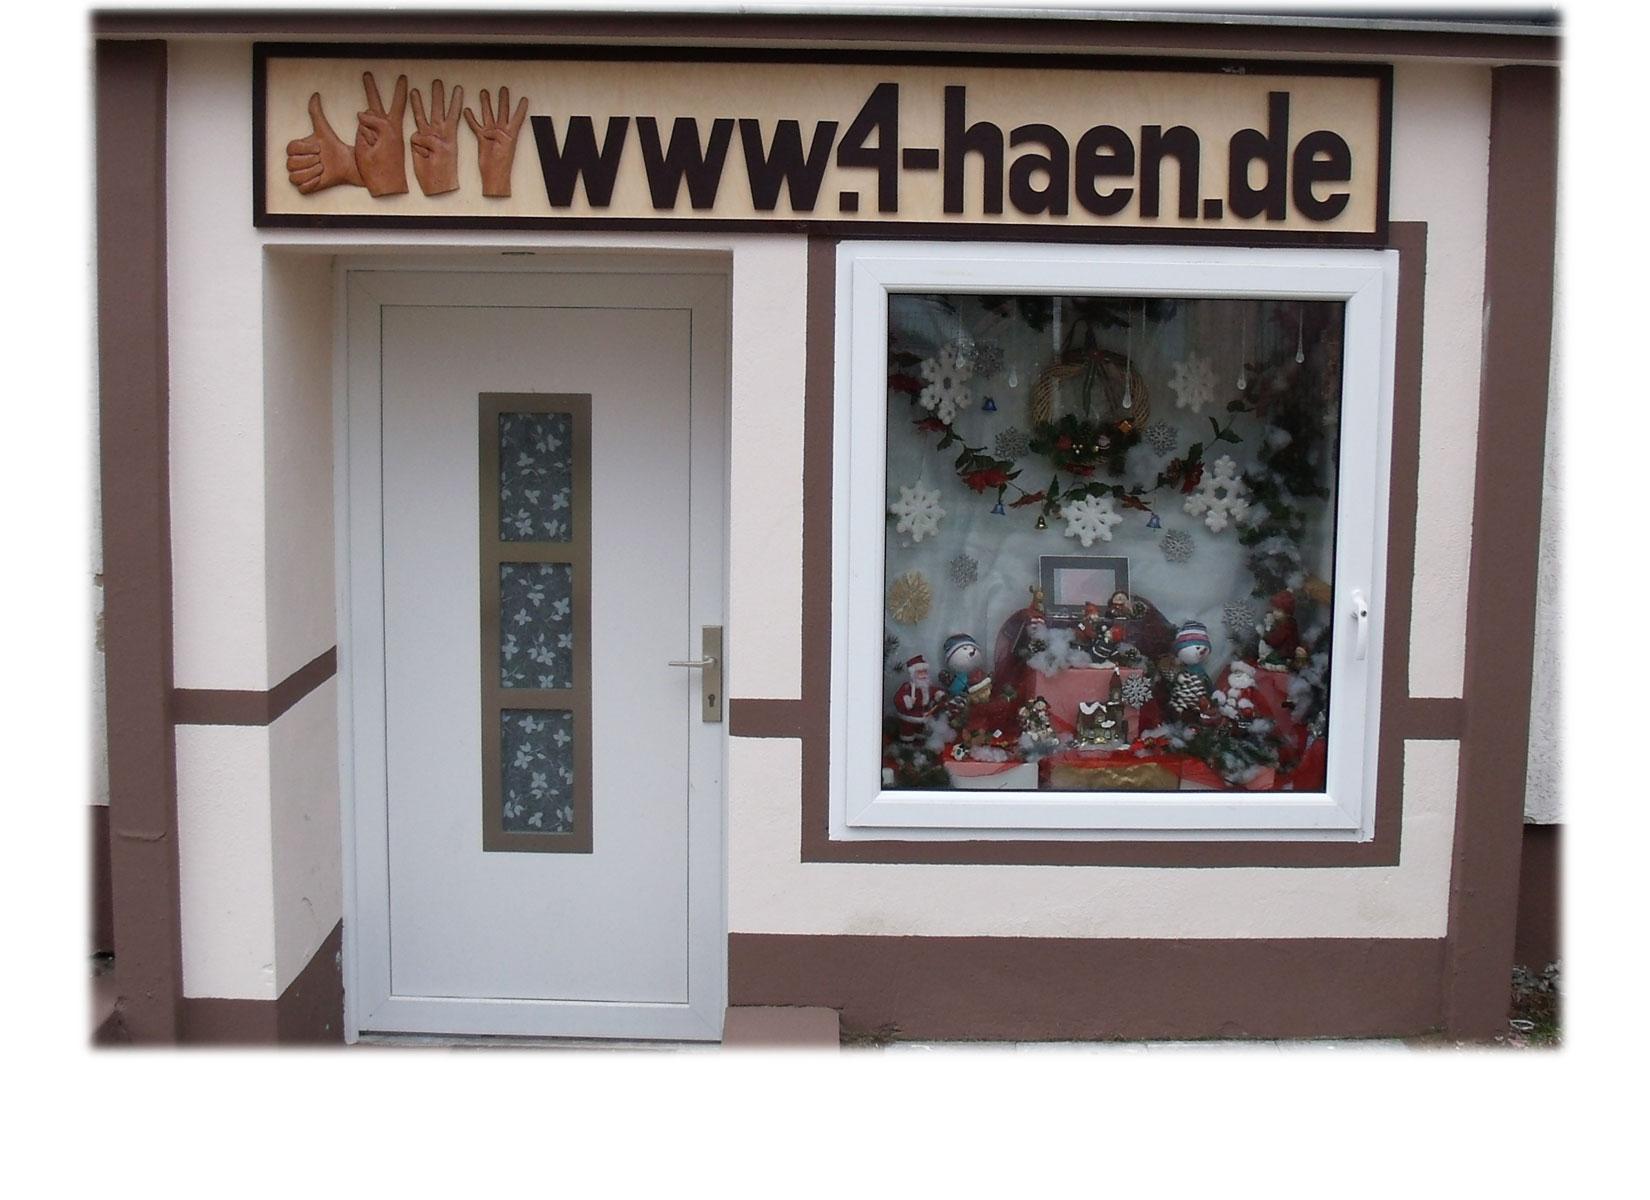 4-haen.de Miniladen